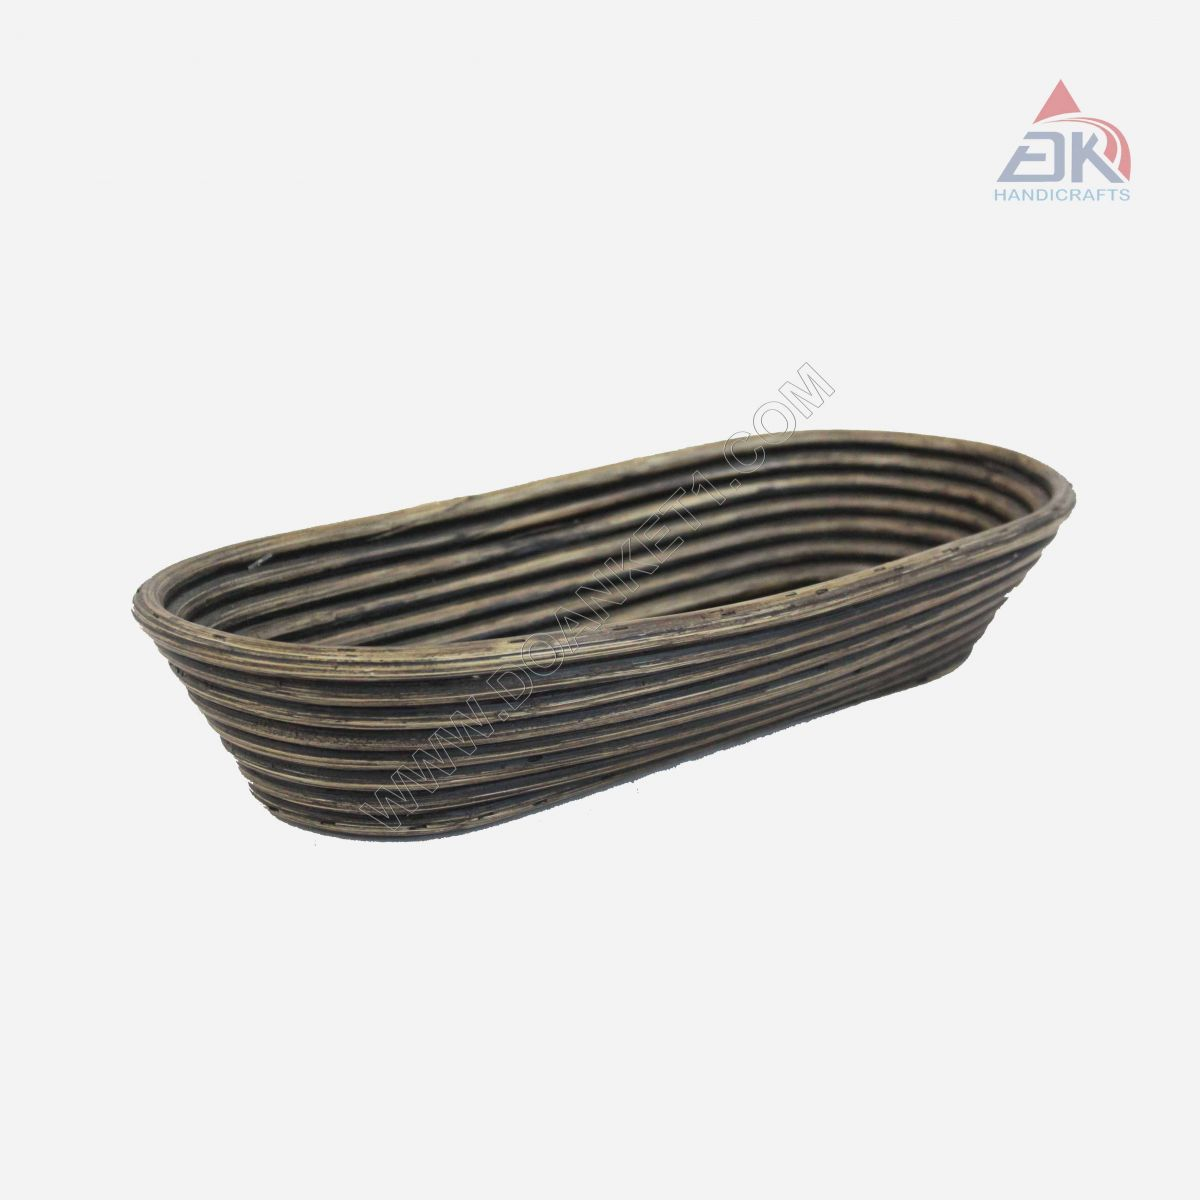 Rattan Coiled Basket # DK33